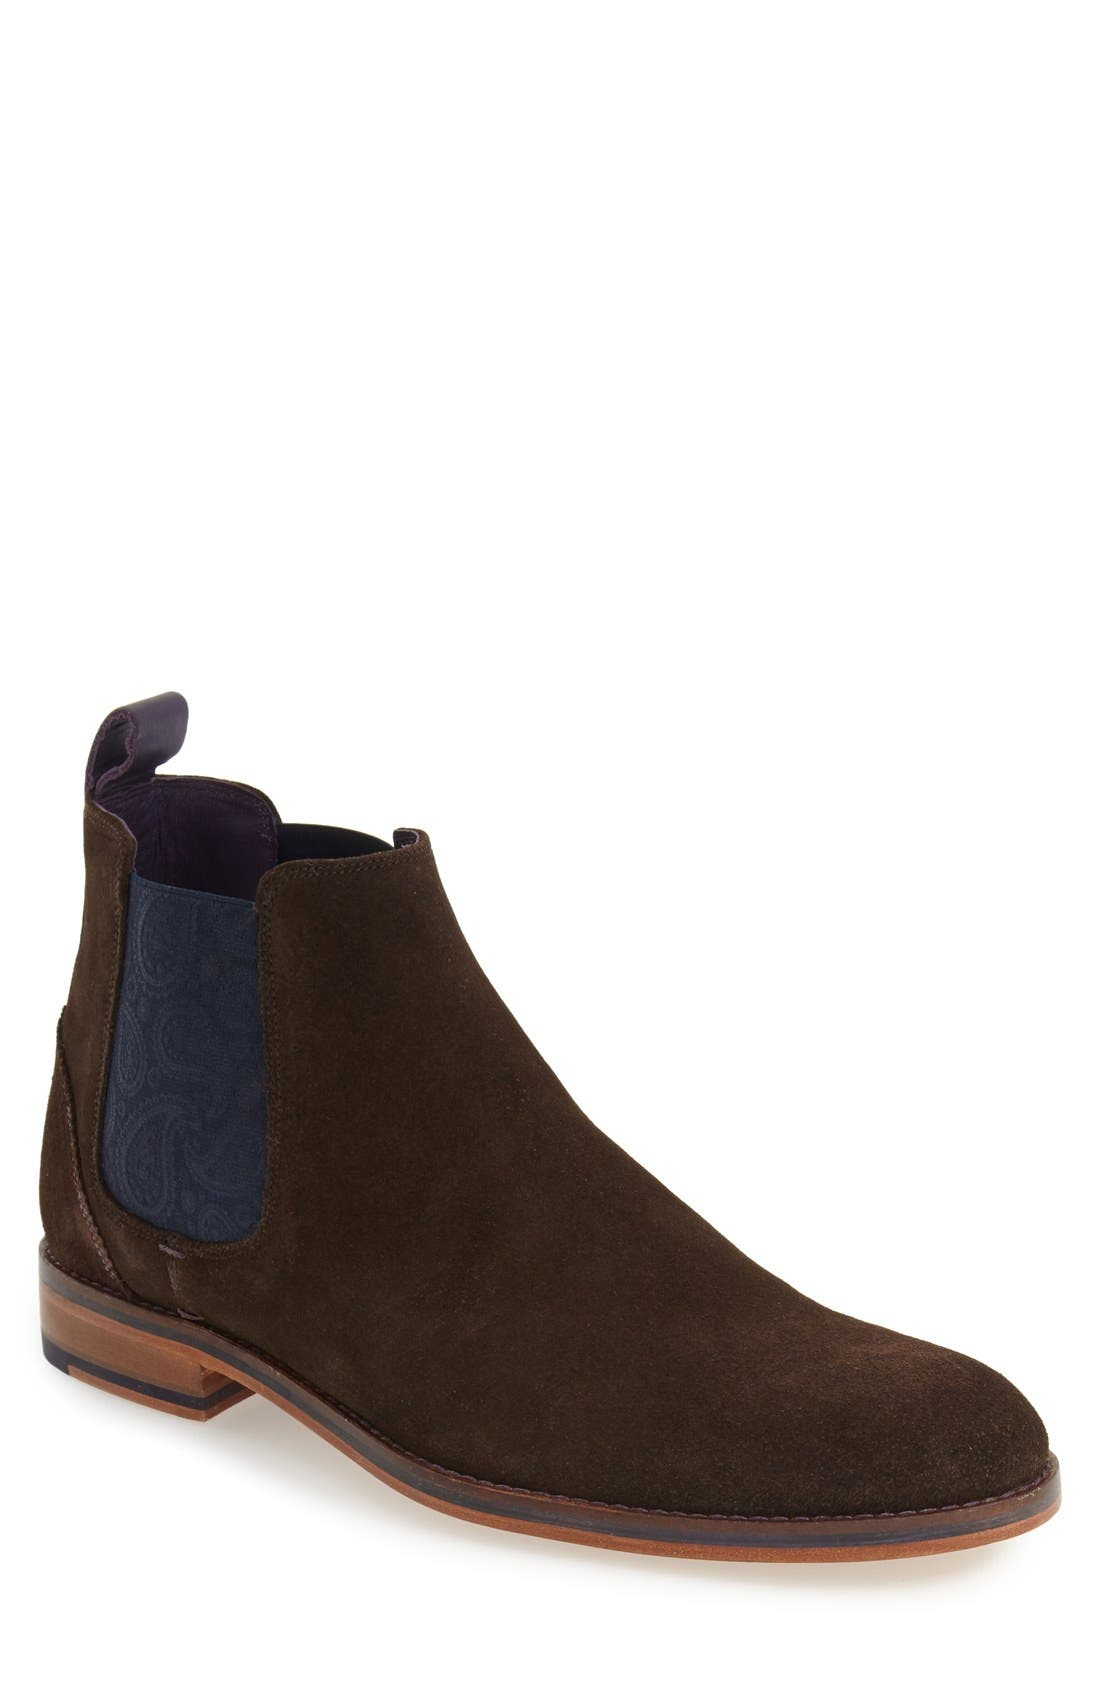 Main Image - Ted Baker London 'Camroon 4' Chelsea Boot (Men)